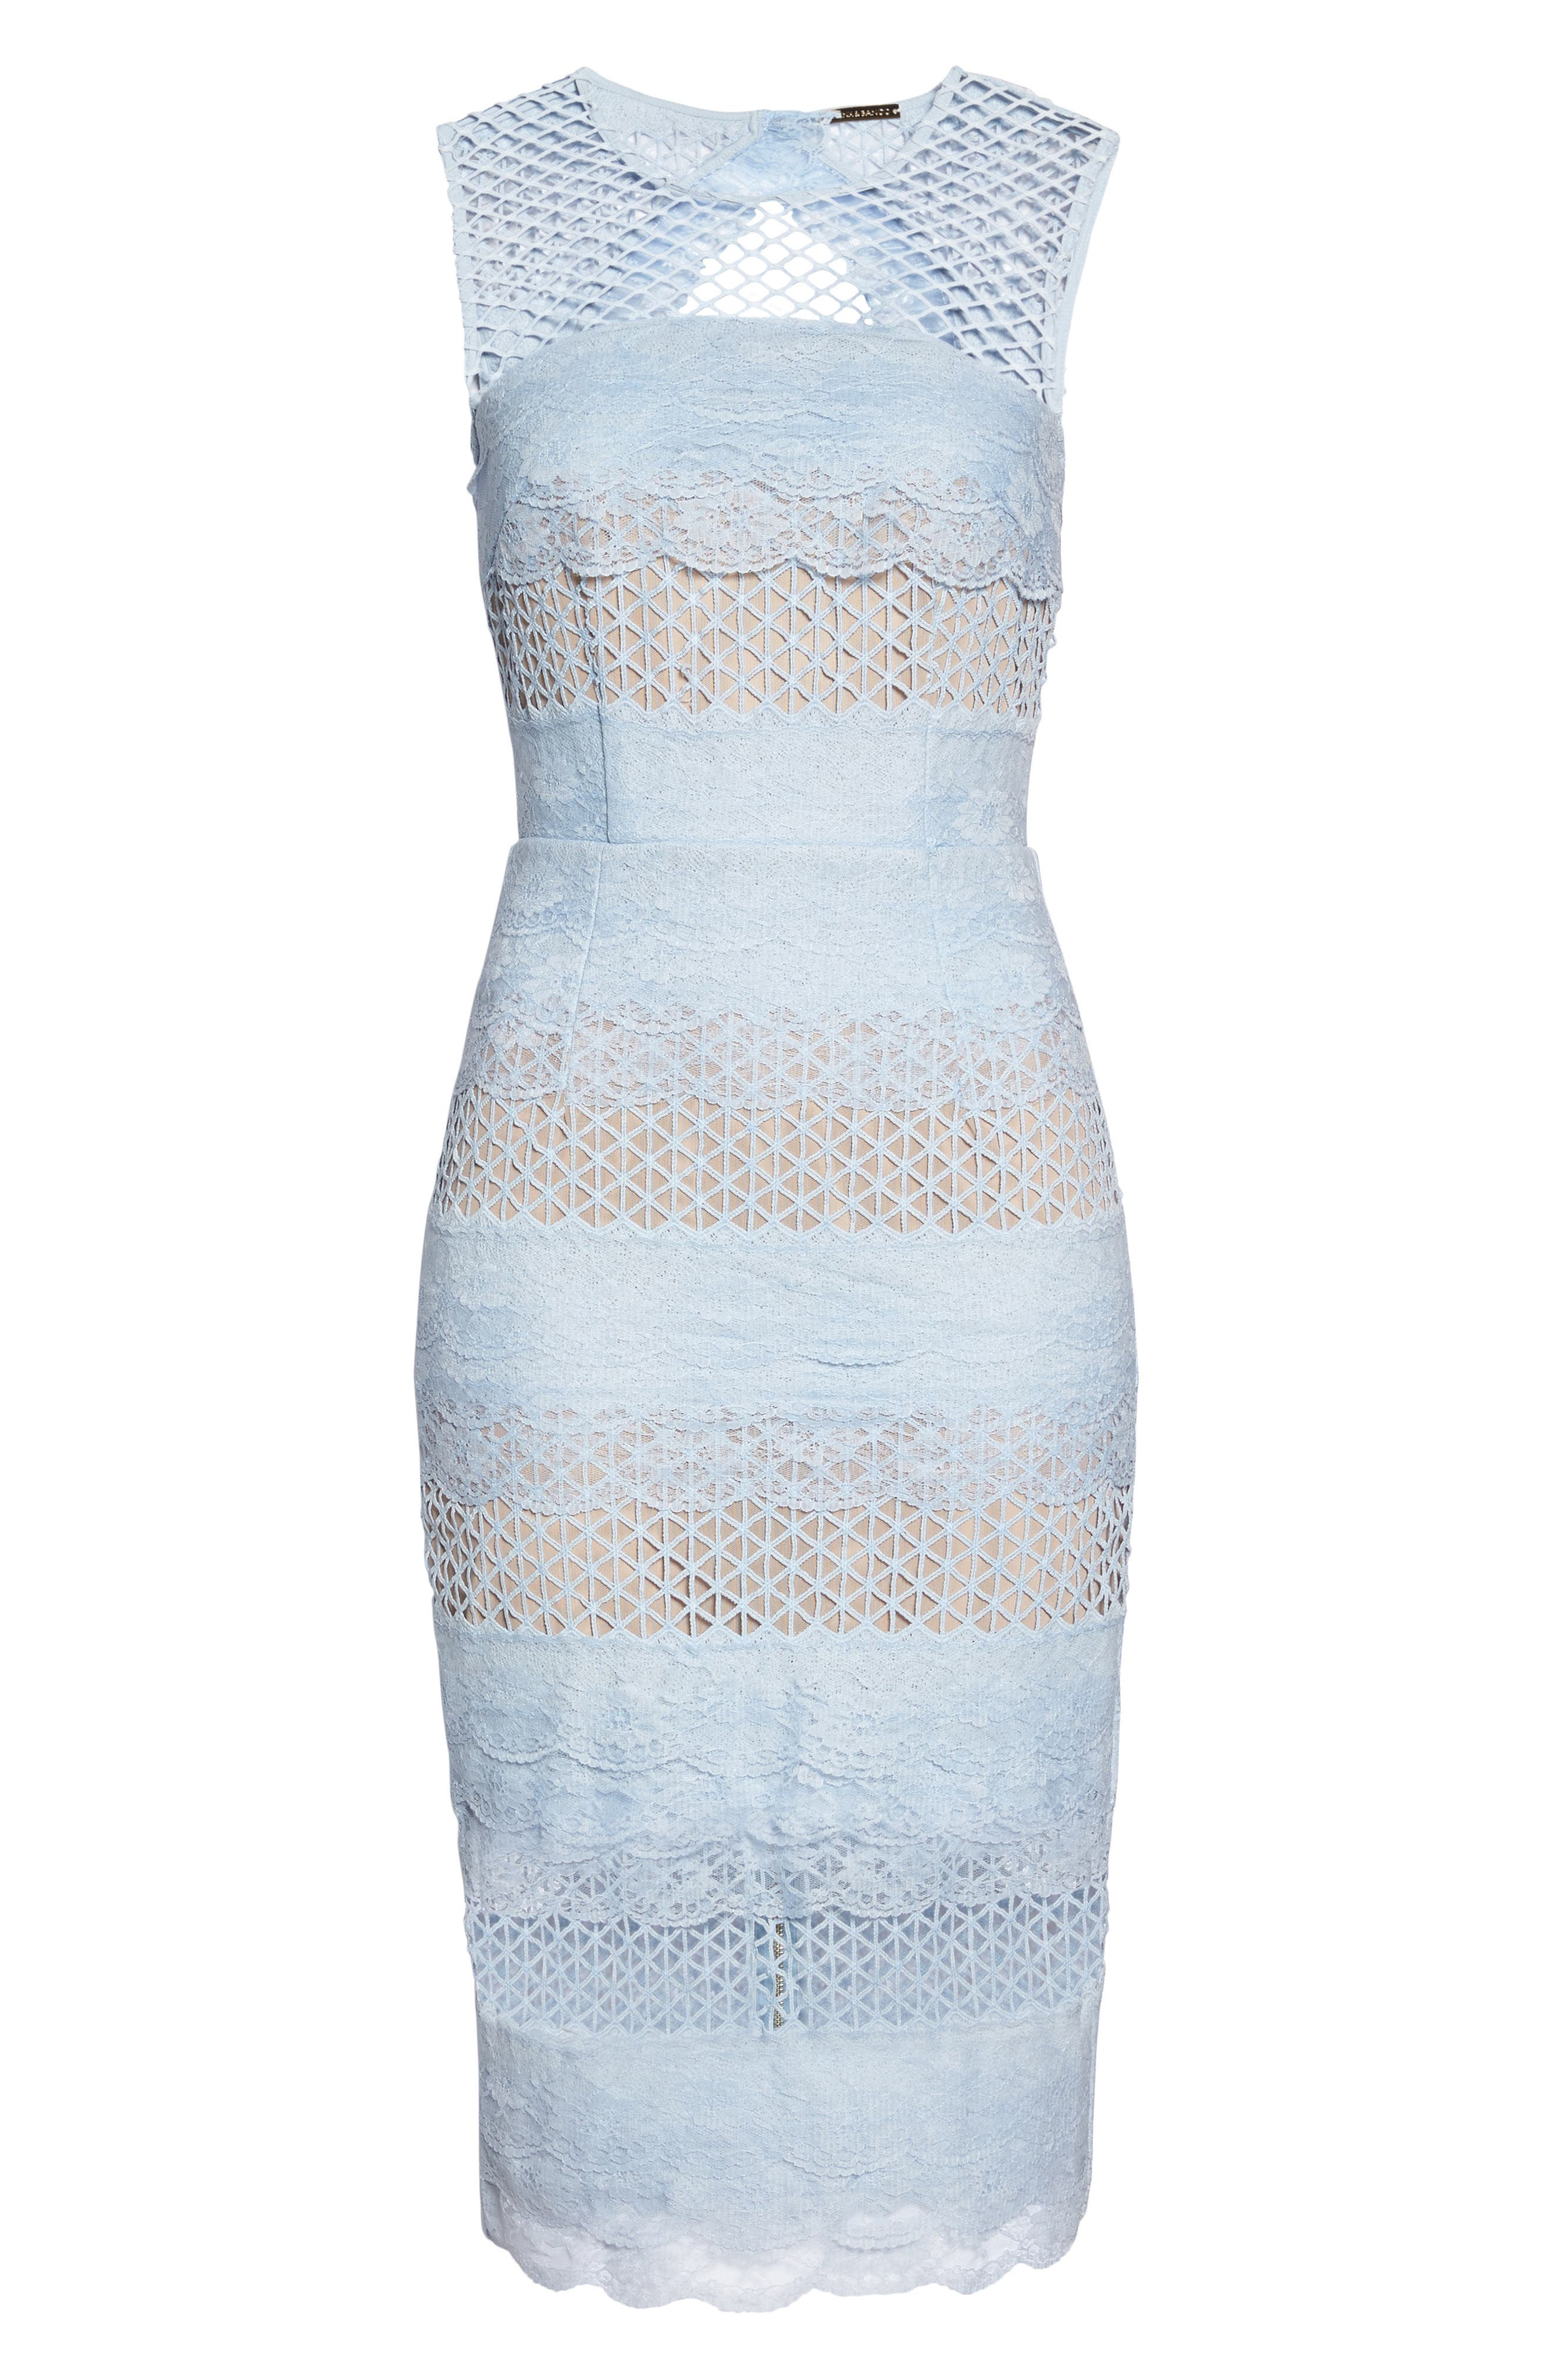 Sienna Lace Panel Sheath Dress,                             Alternate thumbnail 6, color,                             450